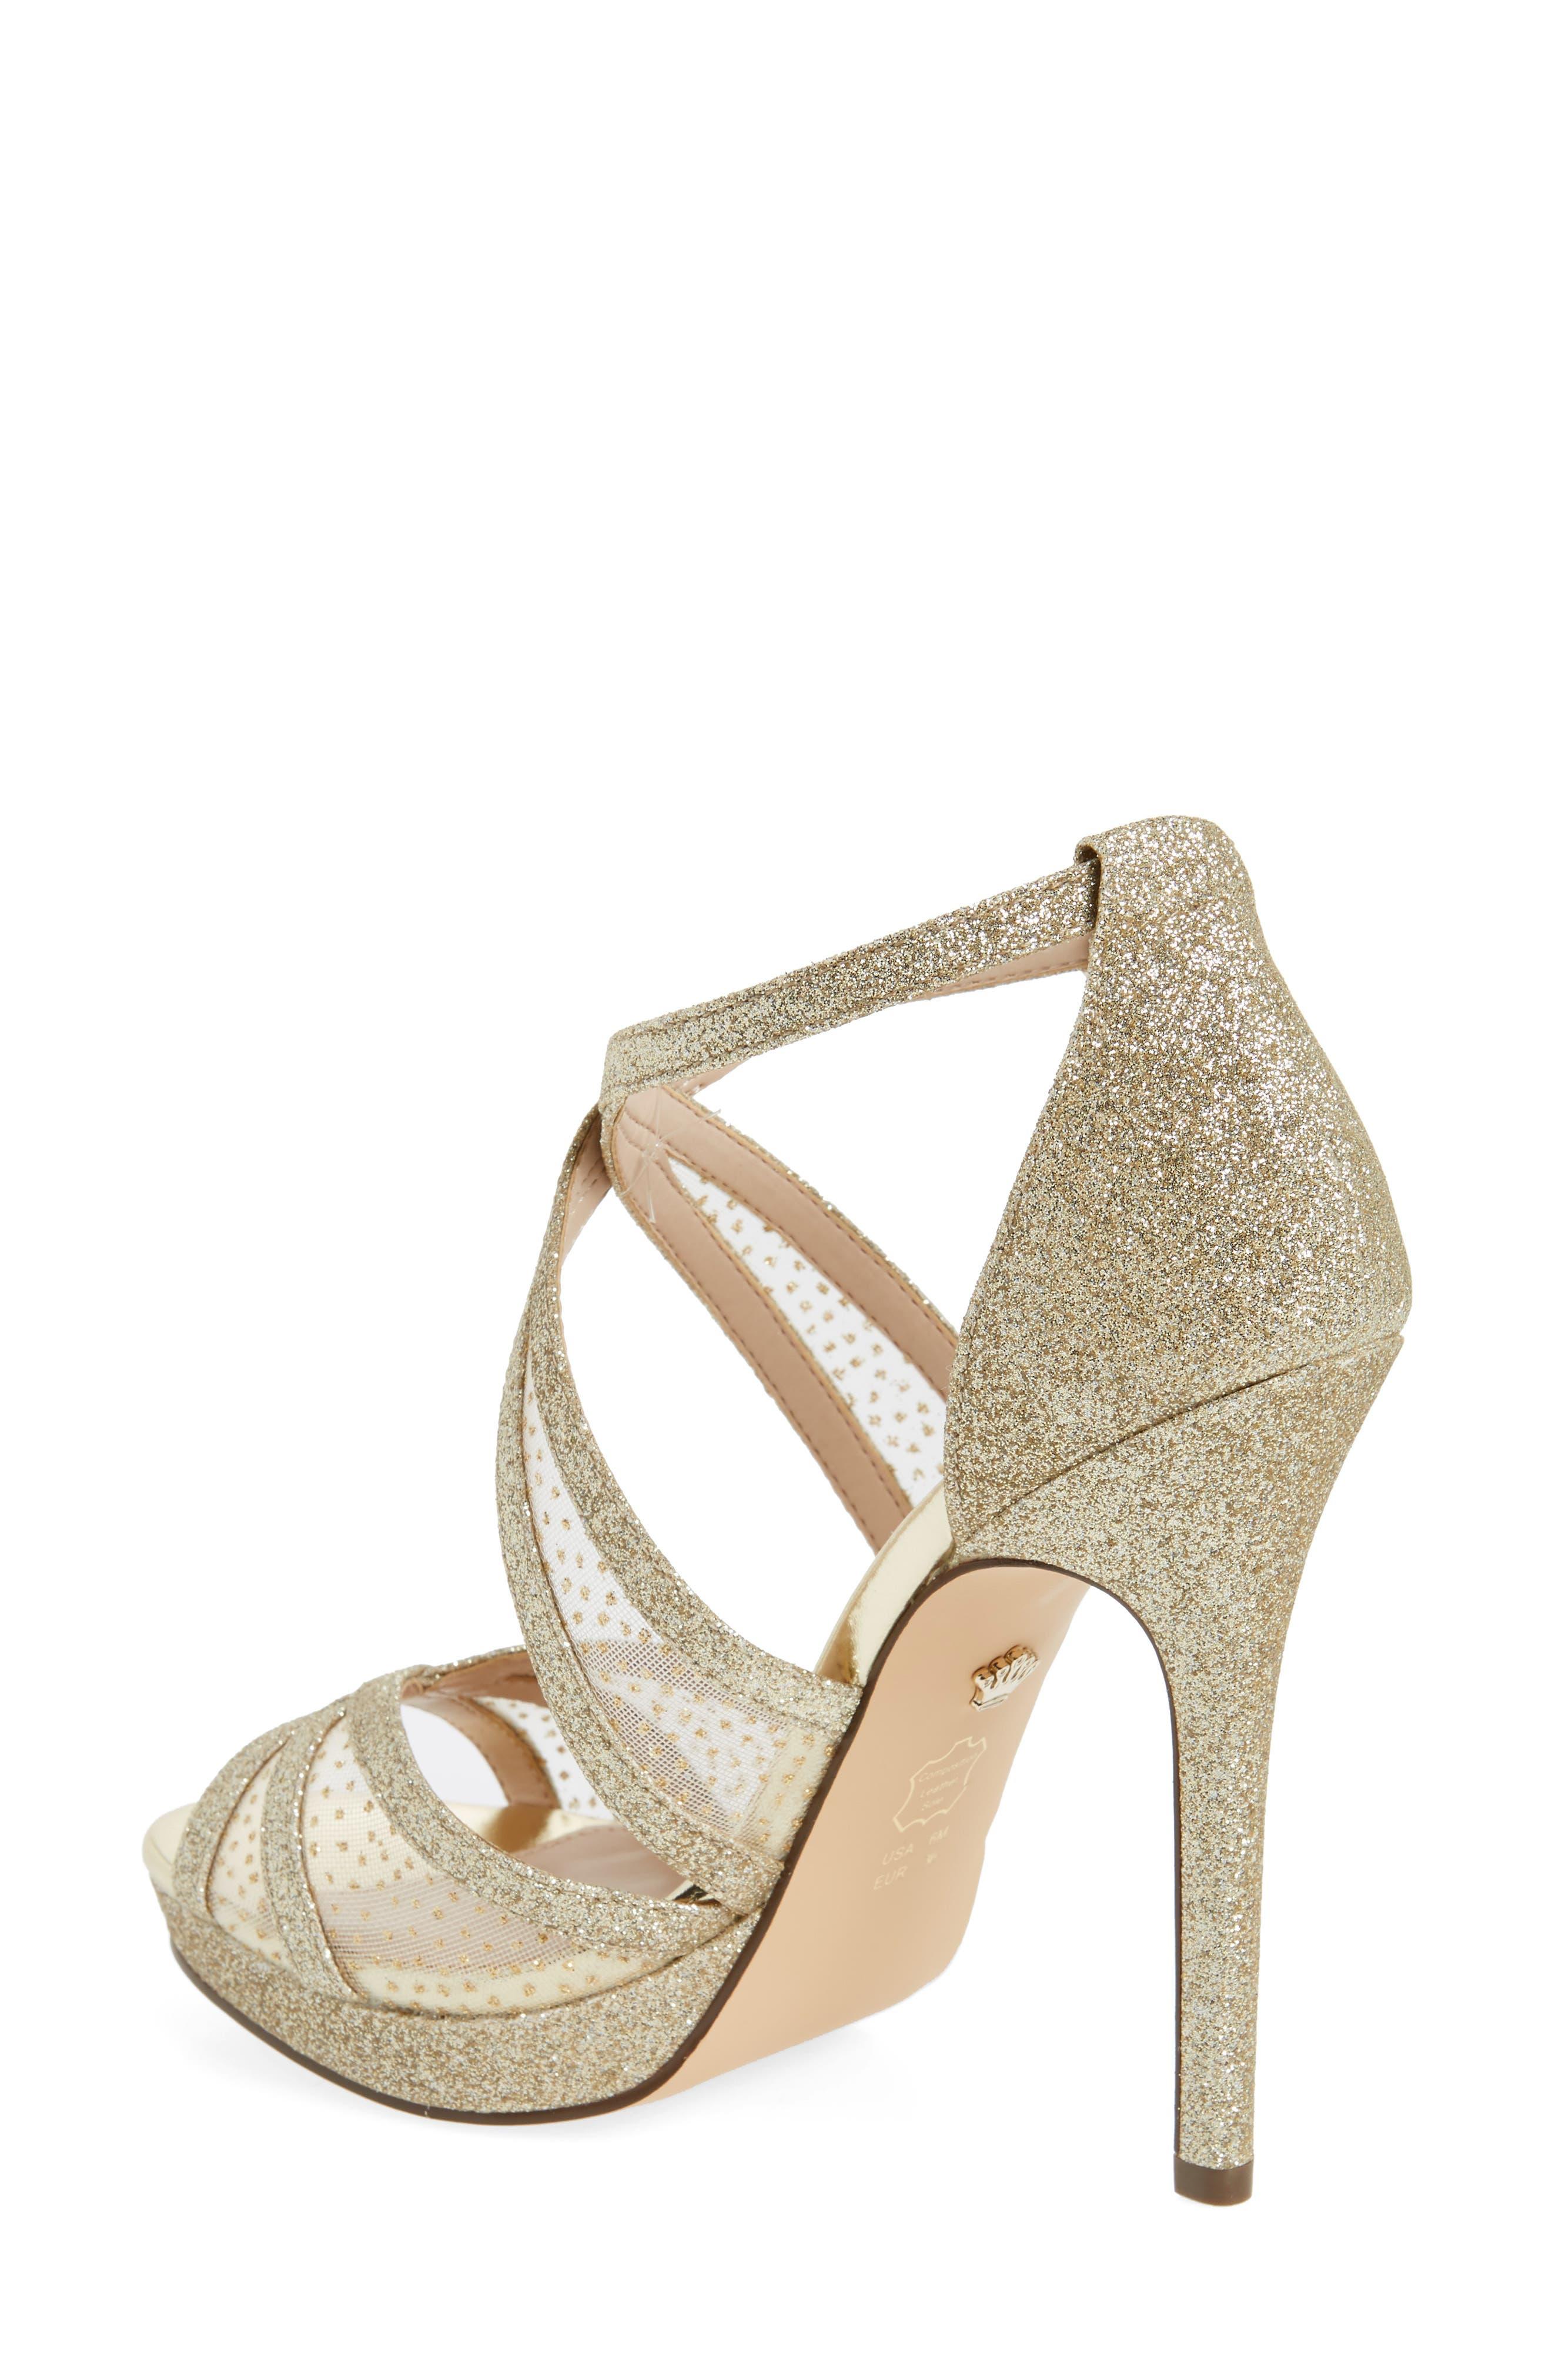 NINA, Fenna Strappy Platform Sandal, Alternate thumbnail 2, color, GOLD GLITTER FABRIC